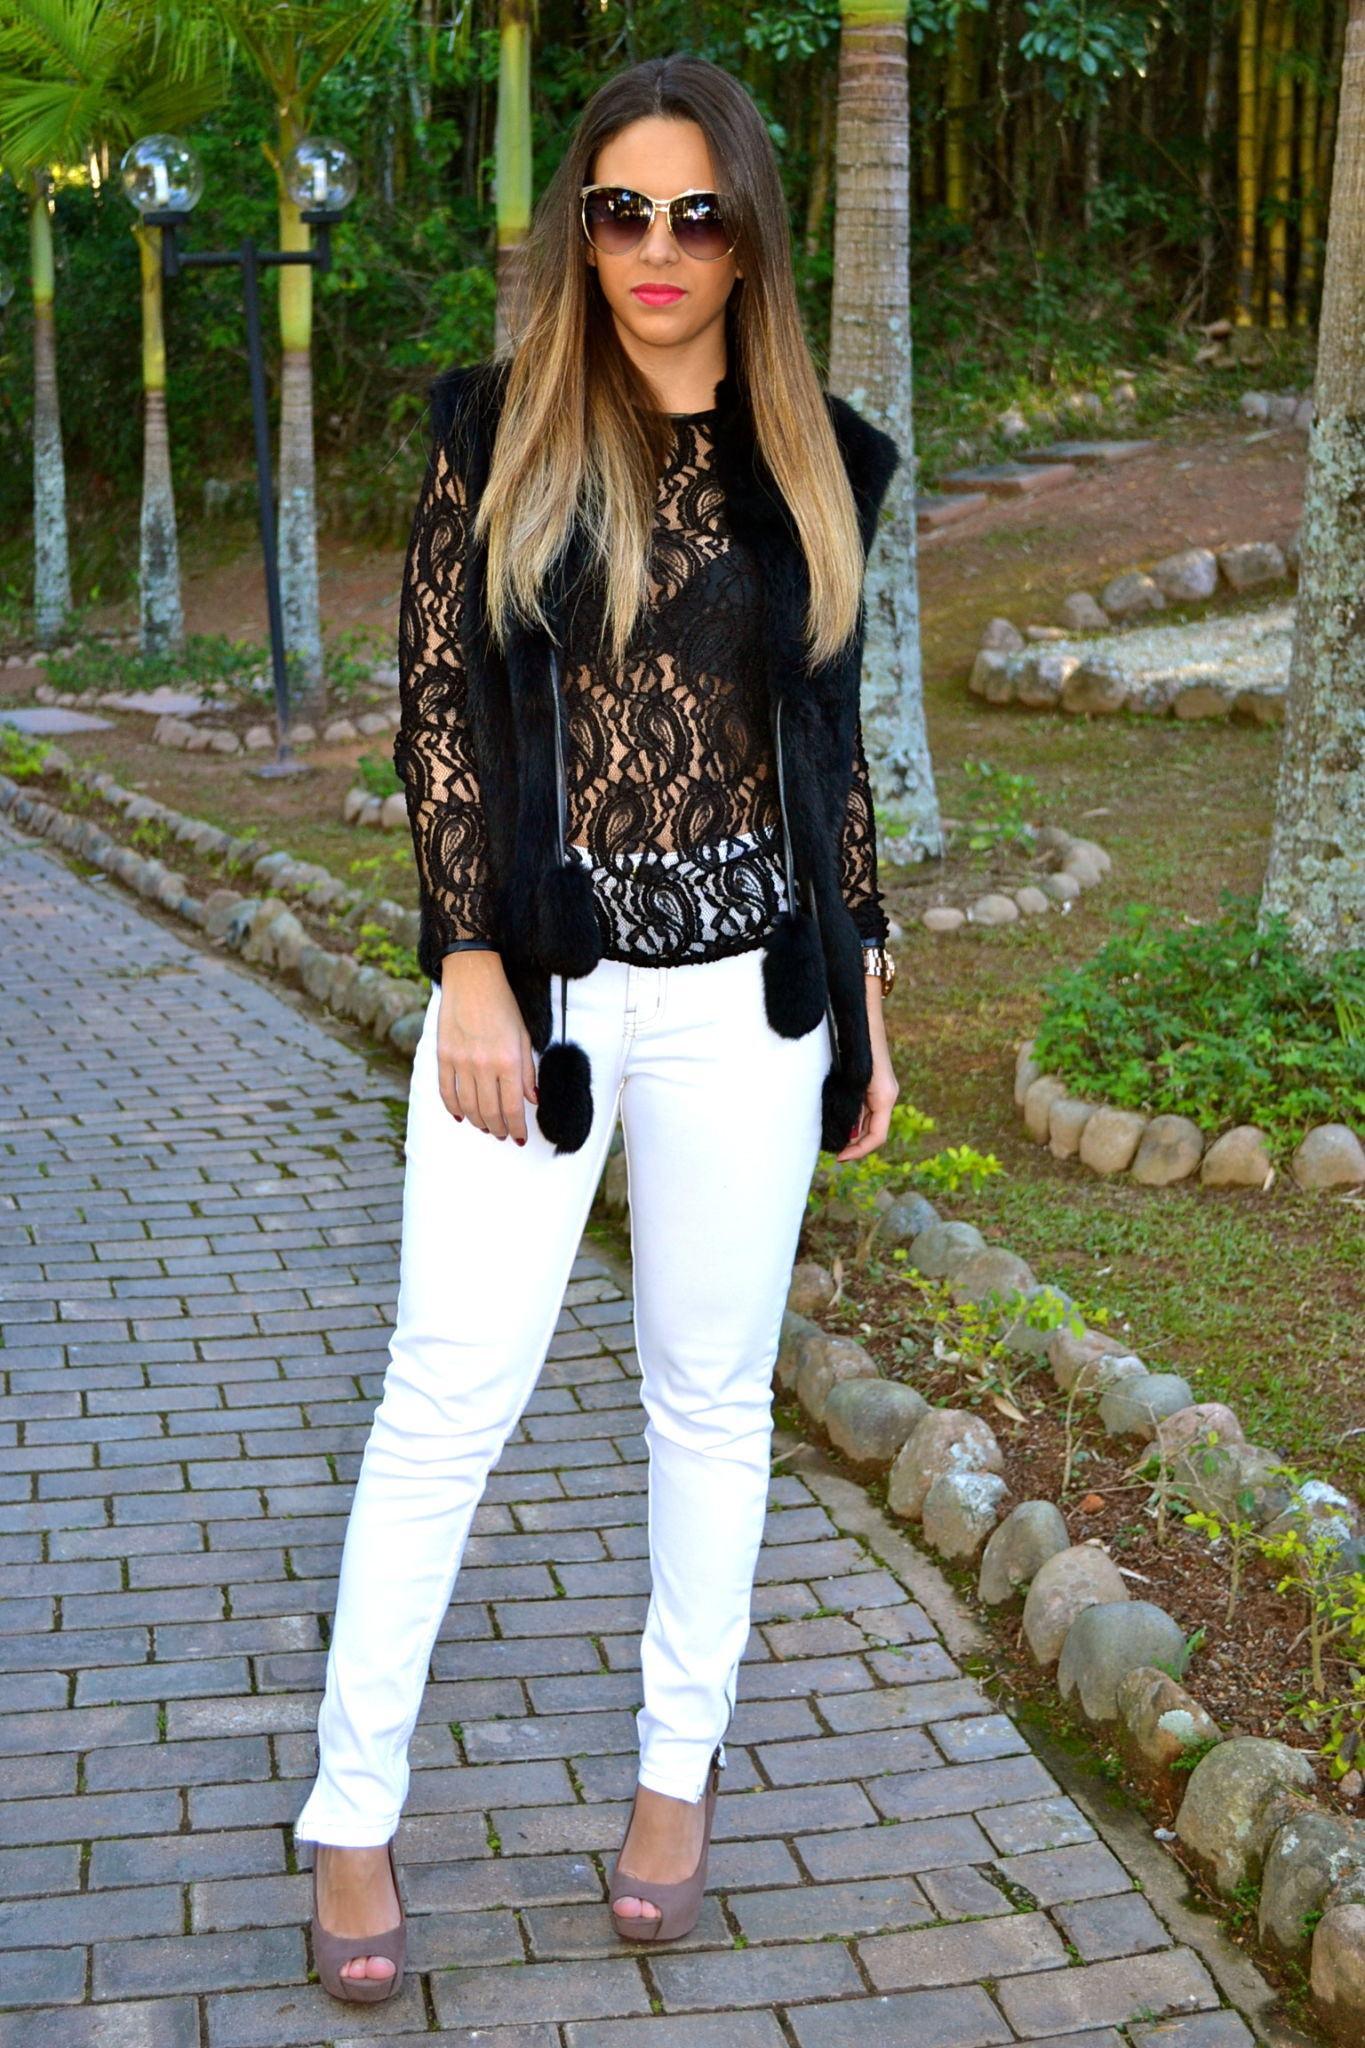 camisa de renda preta e calca branca